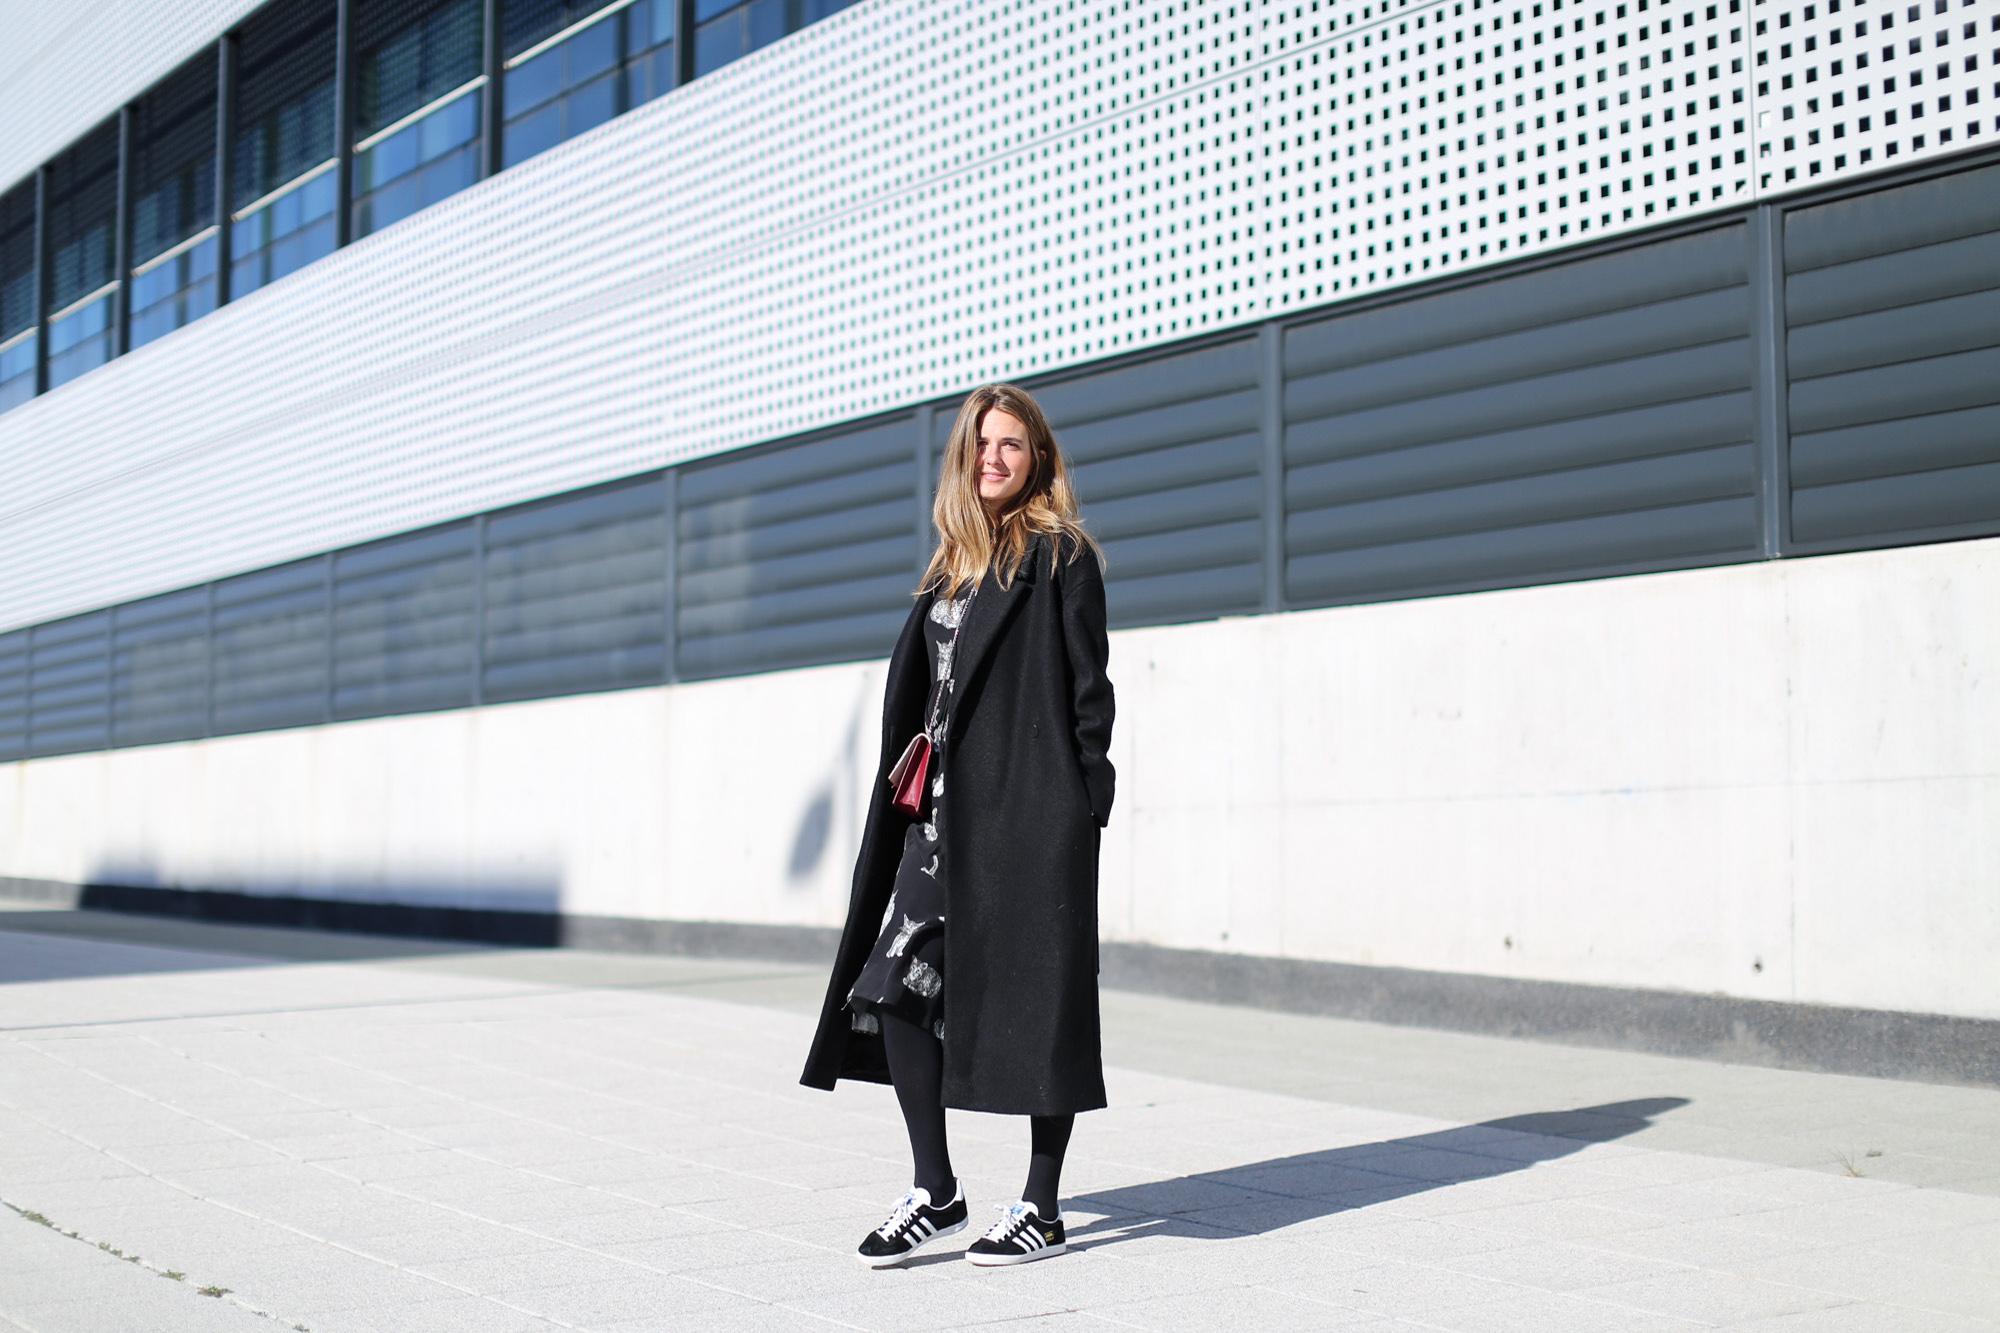 Clochet_fashionblogger_streetstyle_zaracatsprintdmididress_coslongwoolcoat_adidasgazelle_titamadridspiga-2